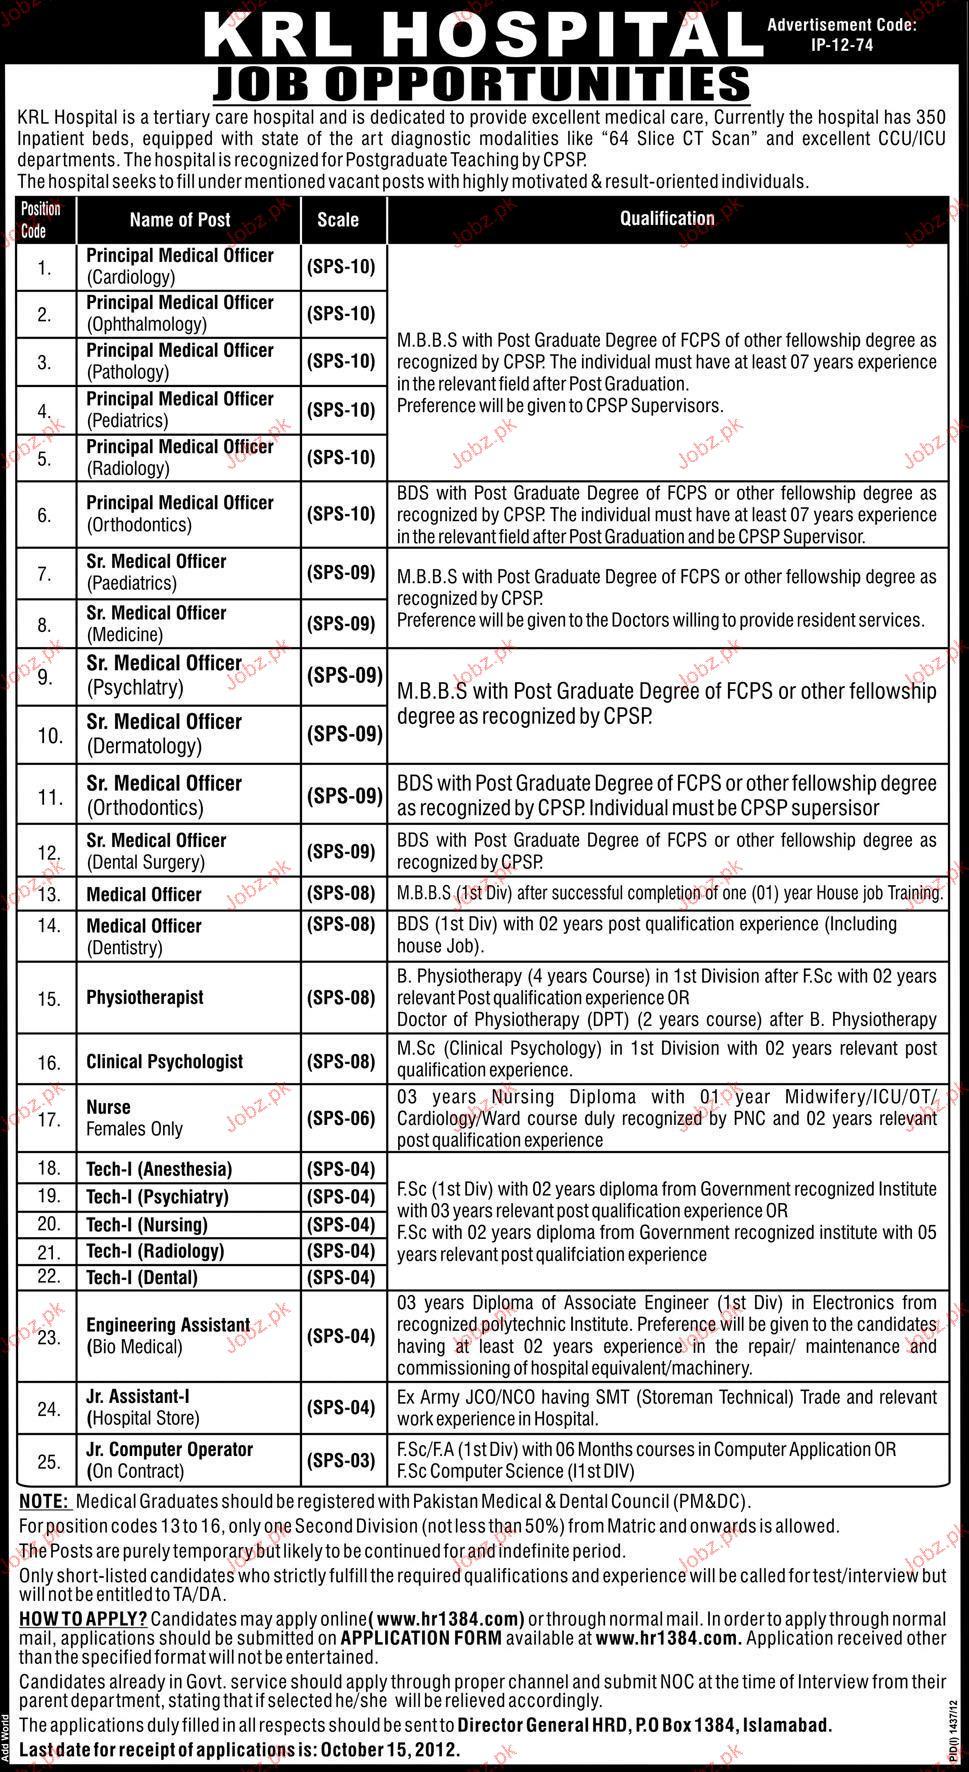 Principal Medical Officers, Senior Medical Officer Required